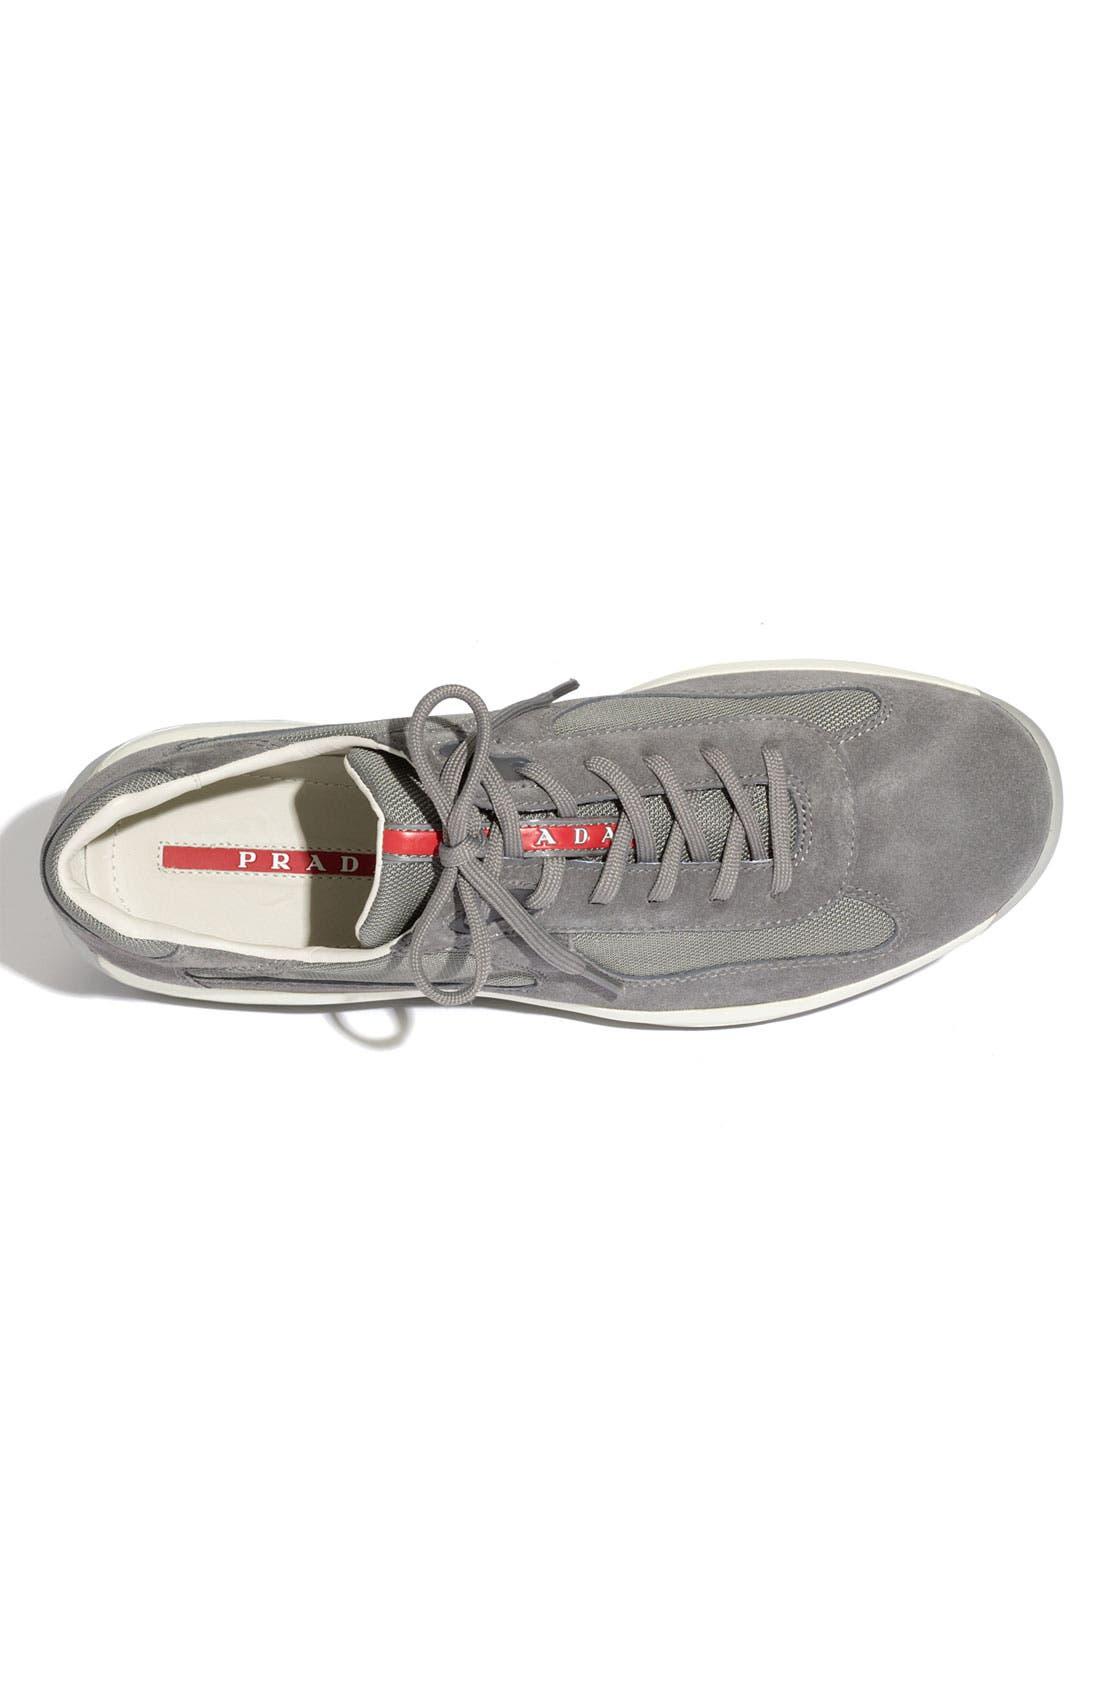 Alternate Image 3  - Prada 'Punta Ala' Suede Sneaker (Men)